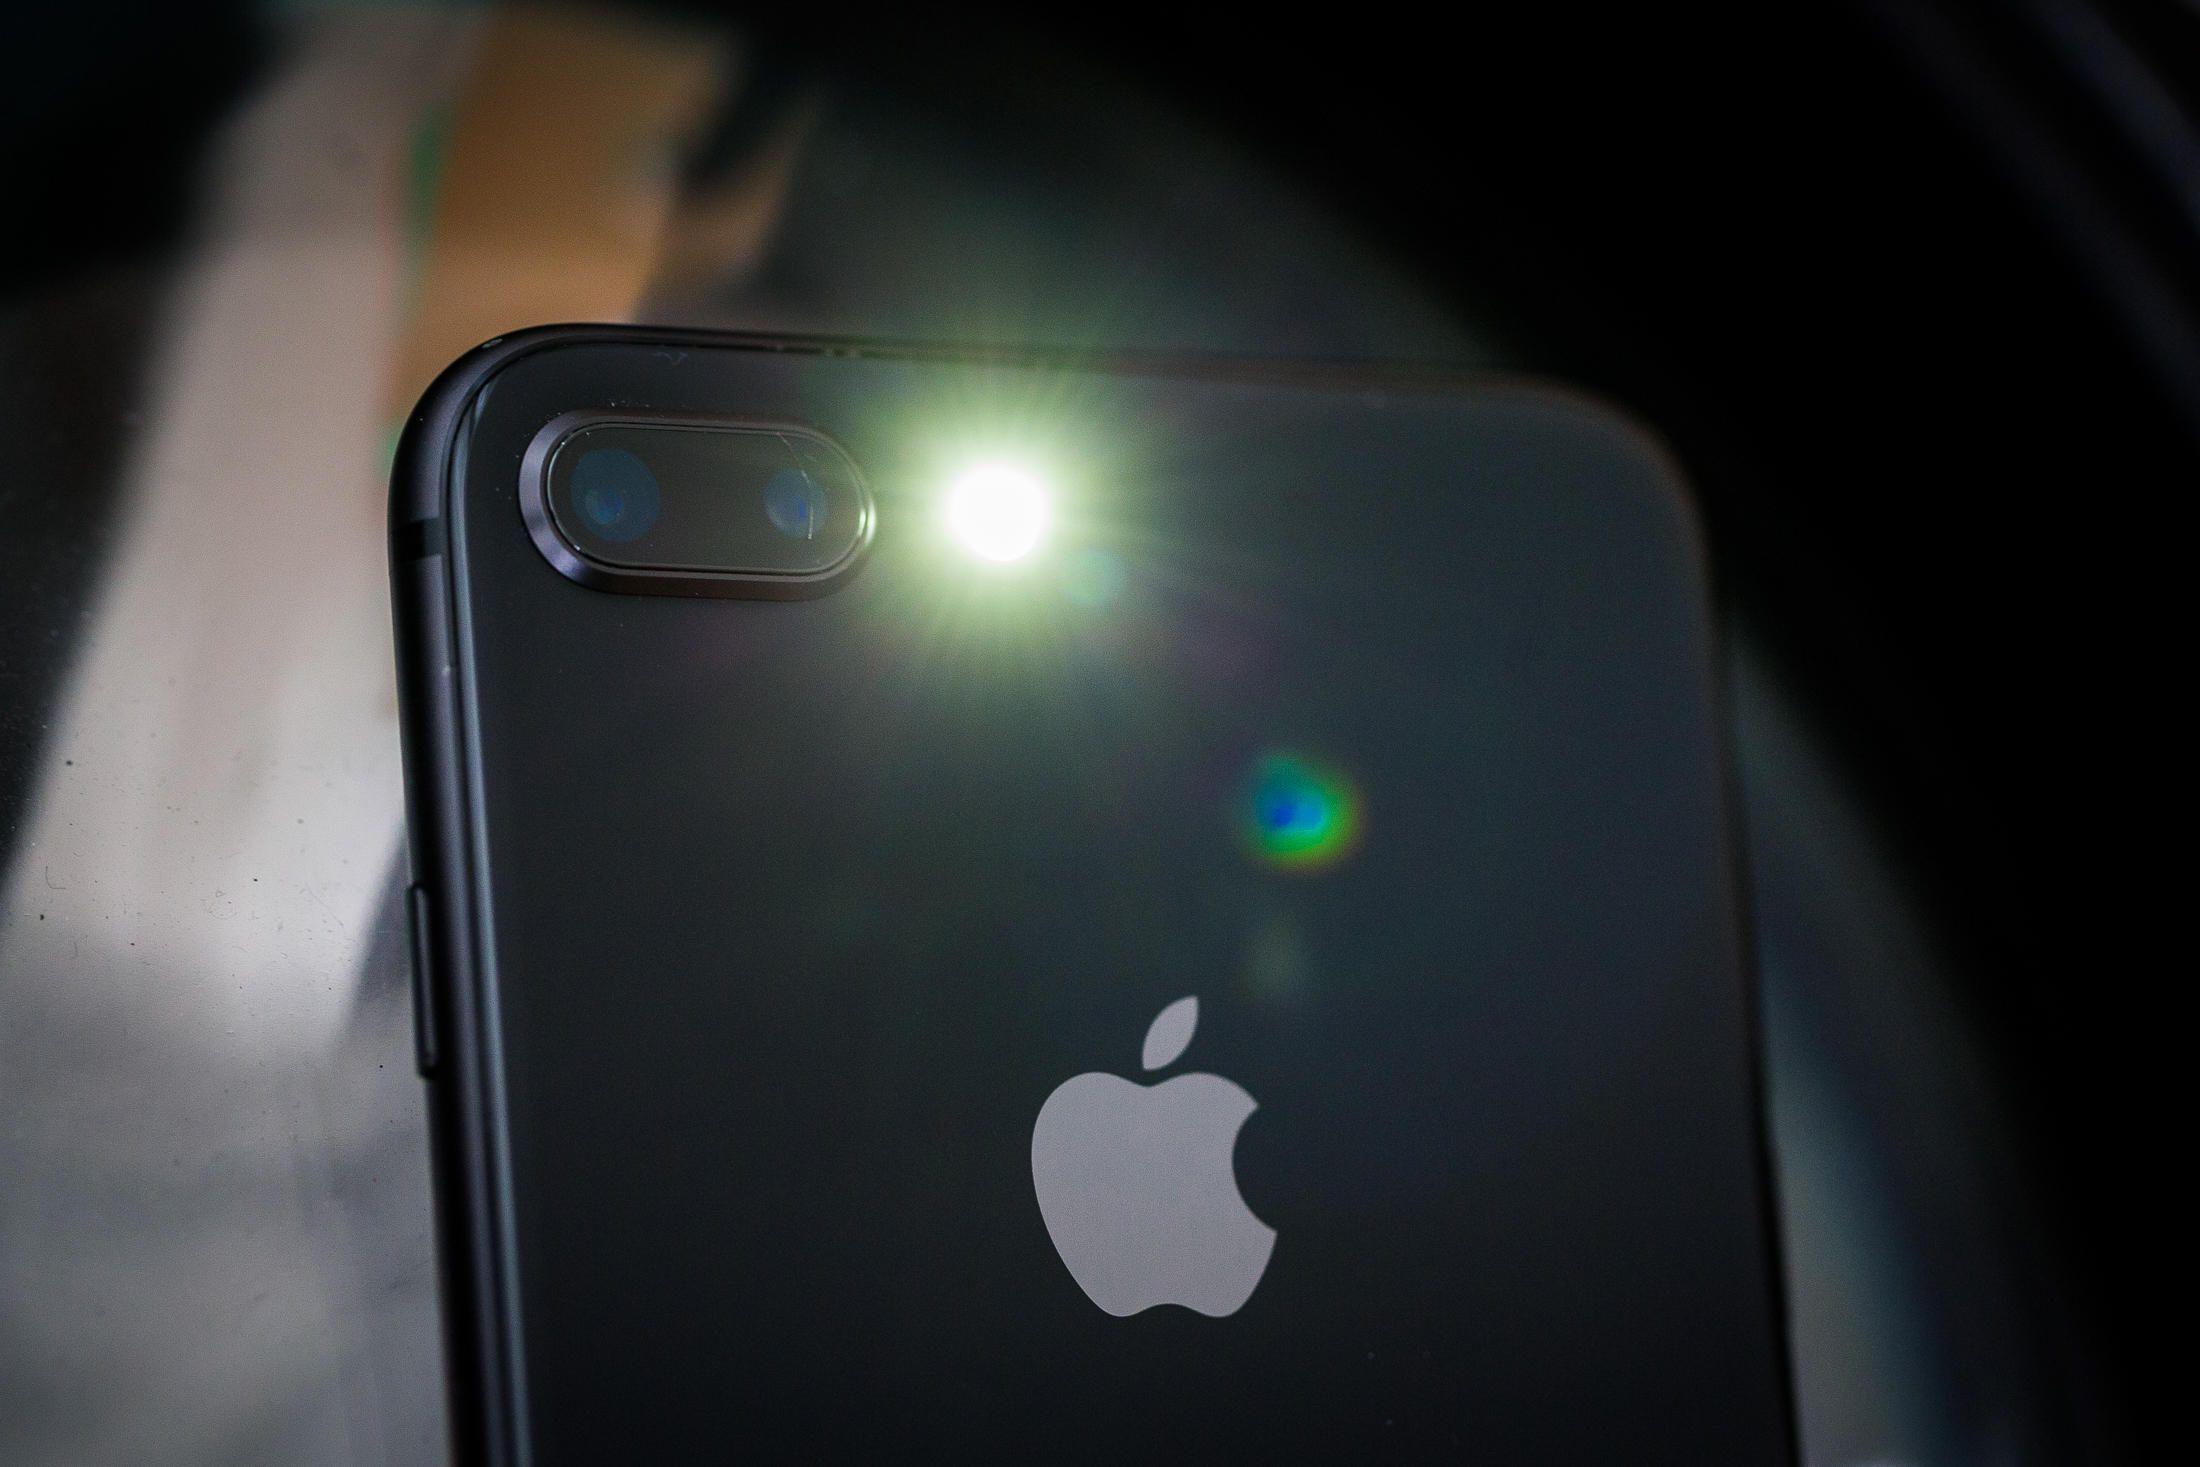 Iphone 8 Plus Flashlight , HD Wallpaper & Backgrounds